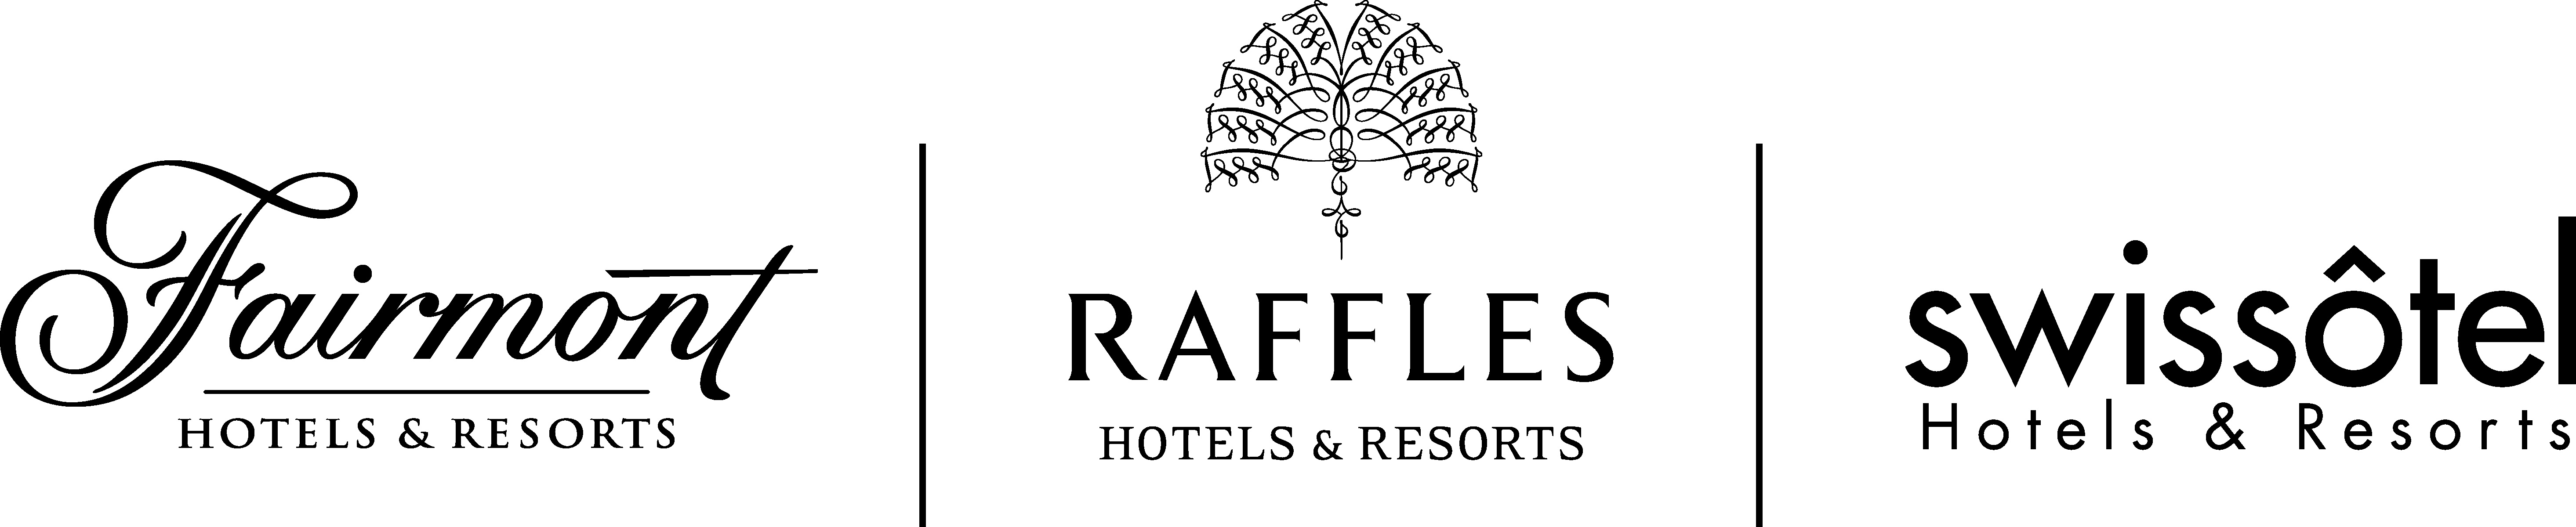 Fairmont Raffles Swissotel logos